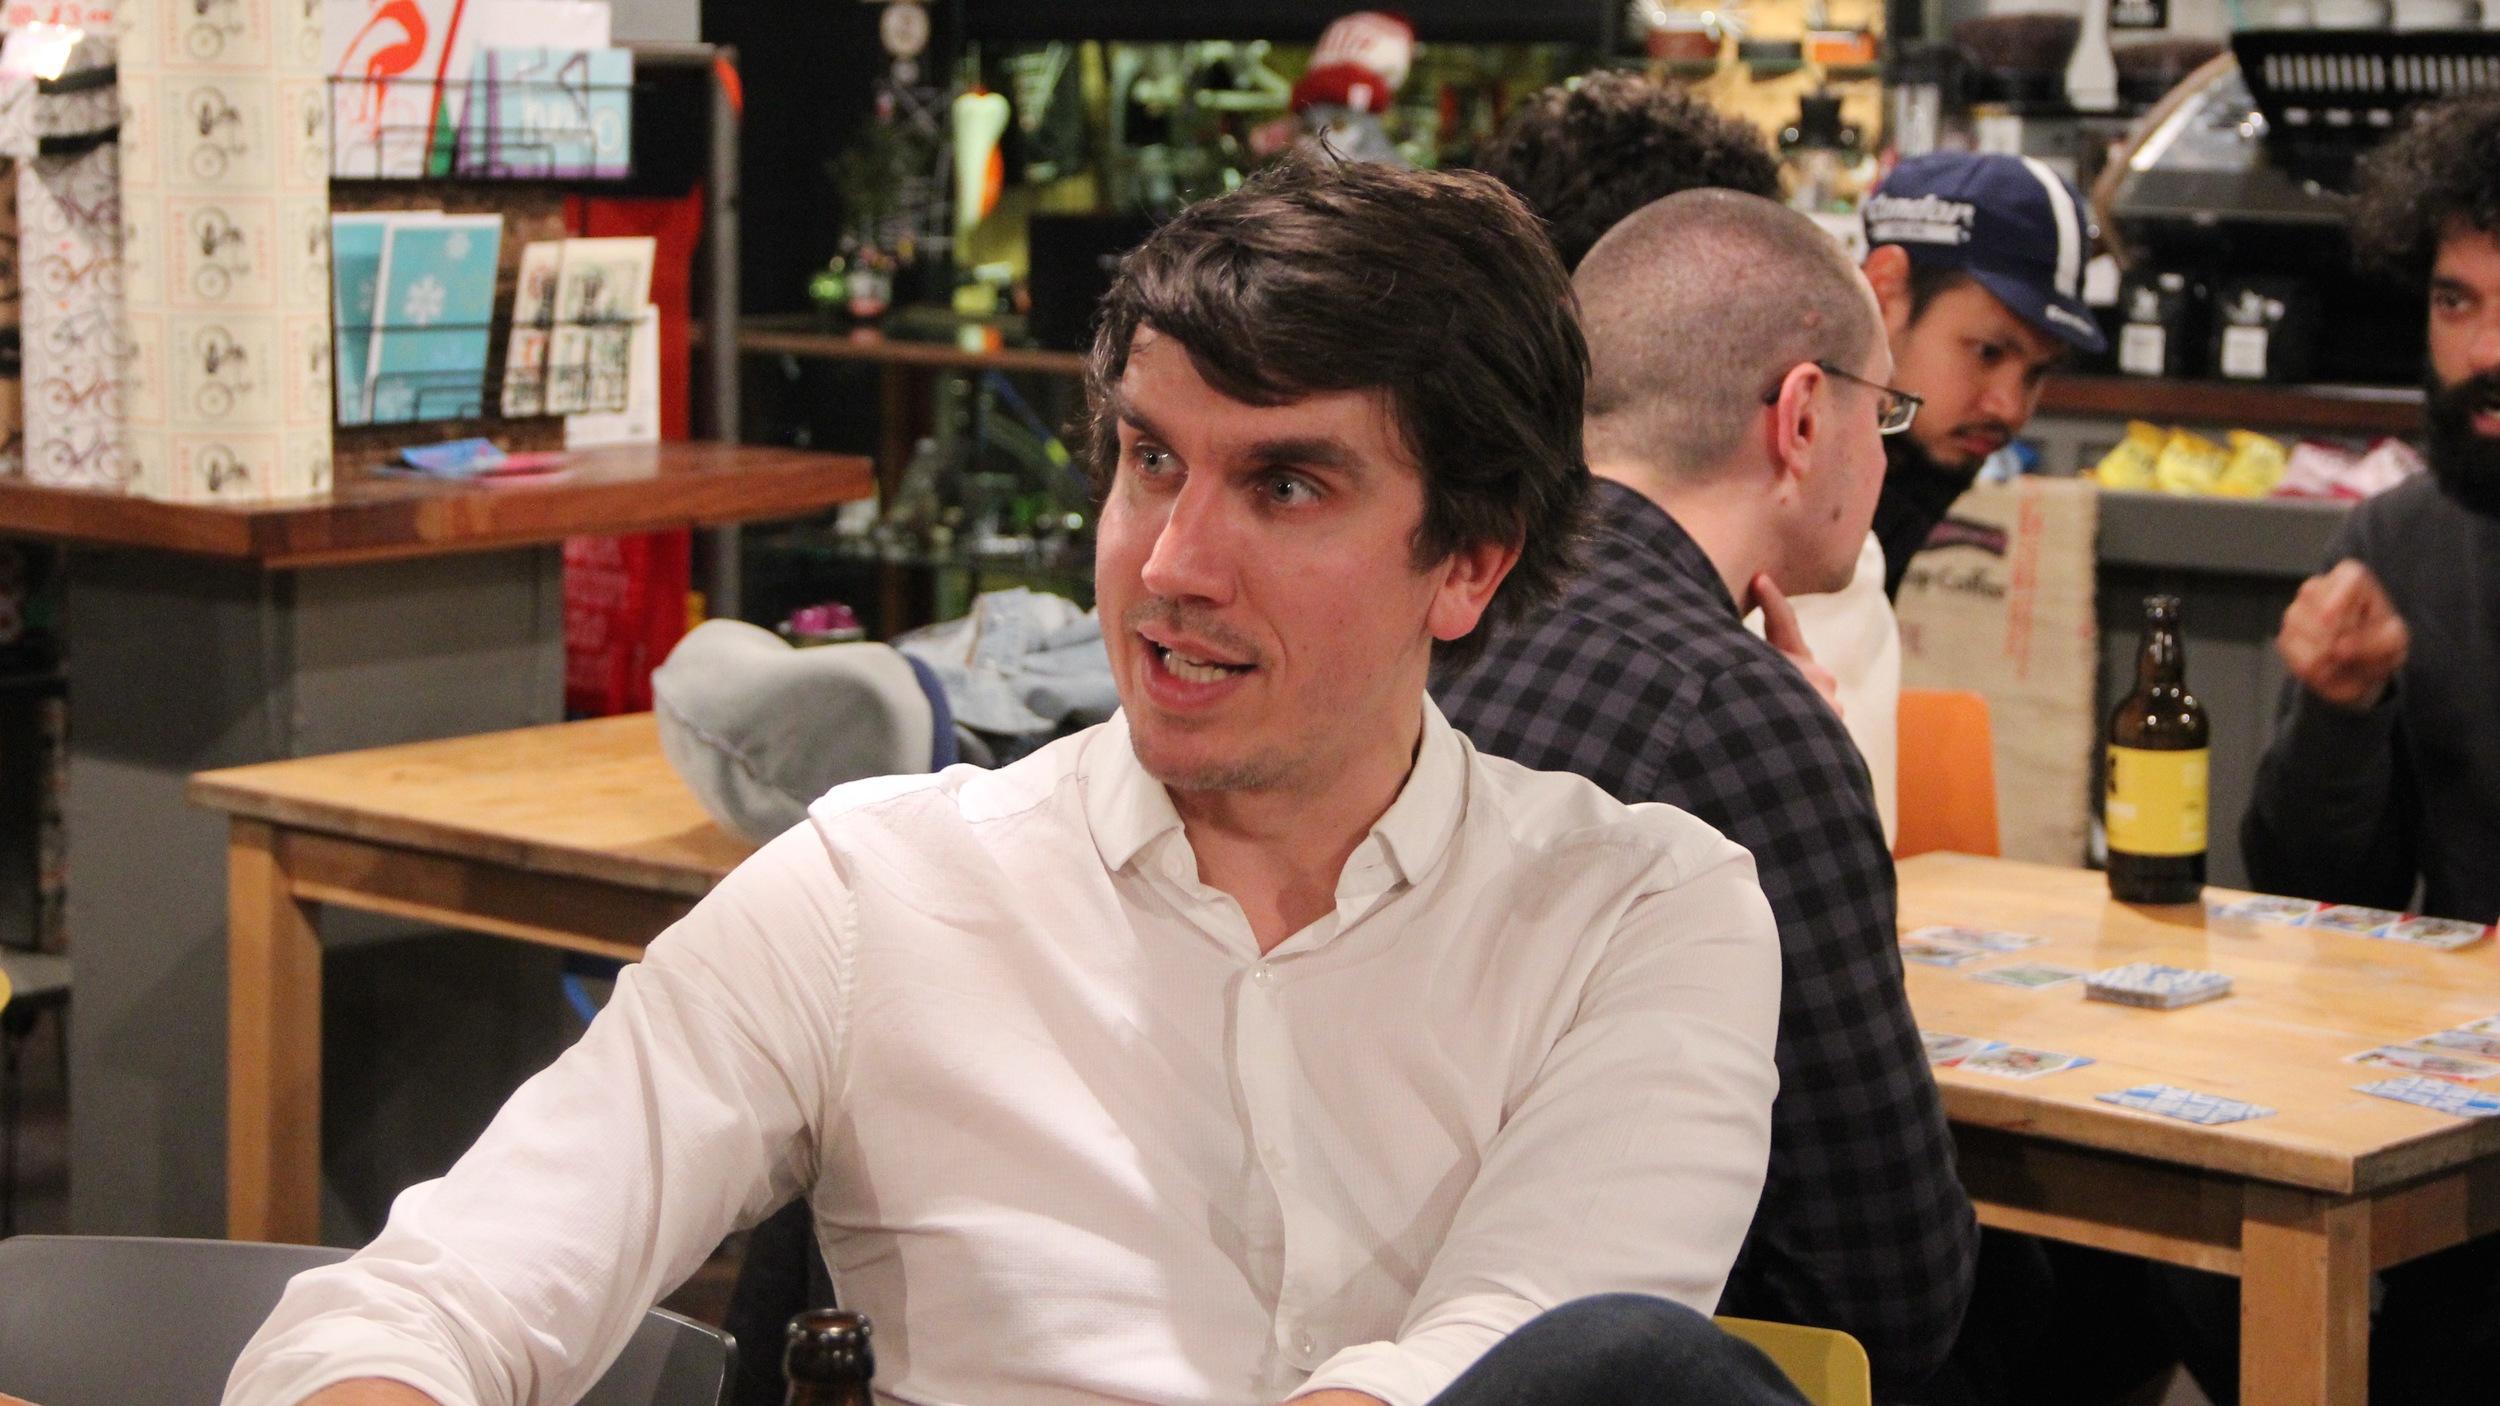 No, it's not an American sit-com actor, it's Ben Nickolls, software developer